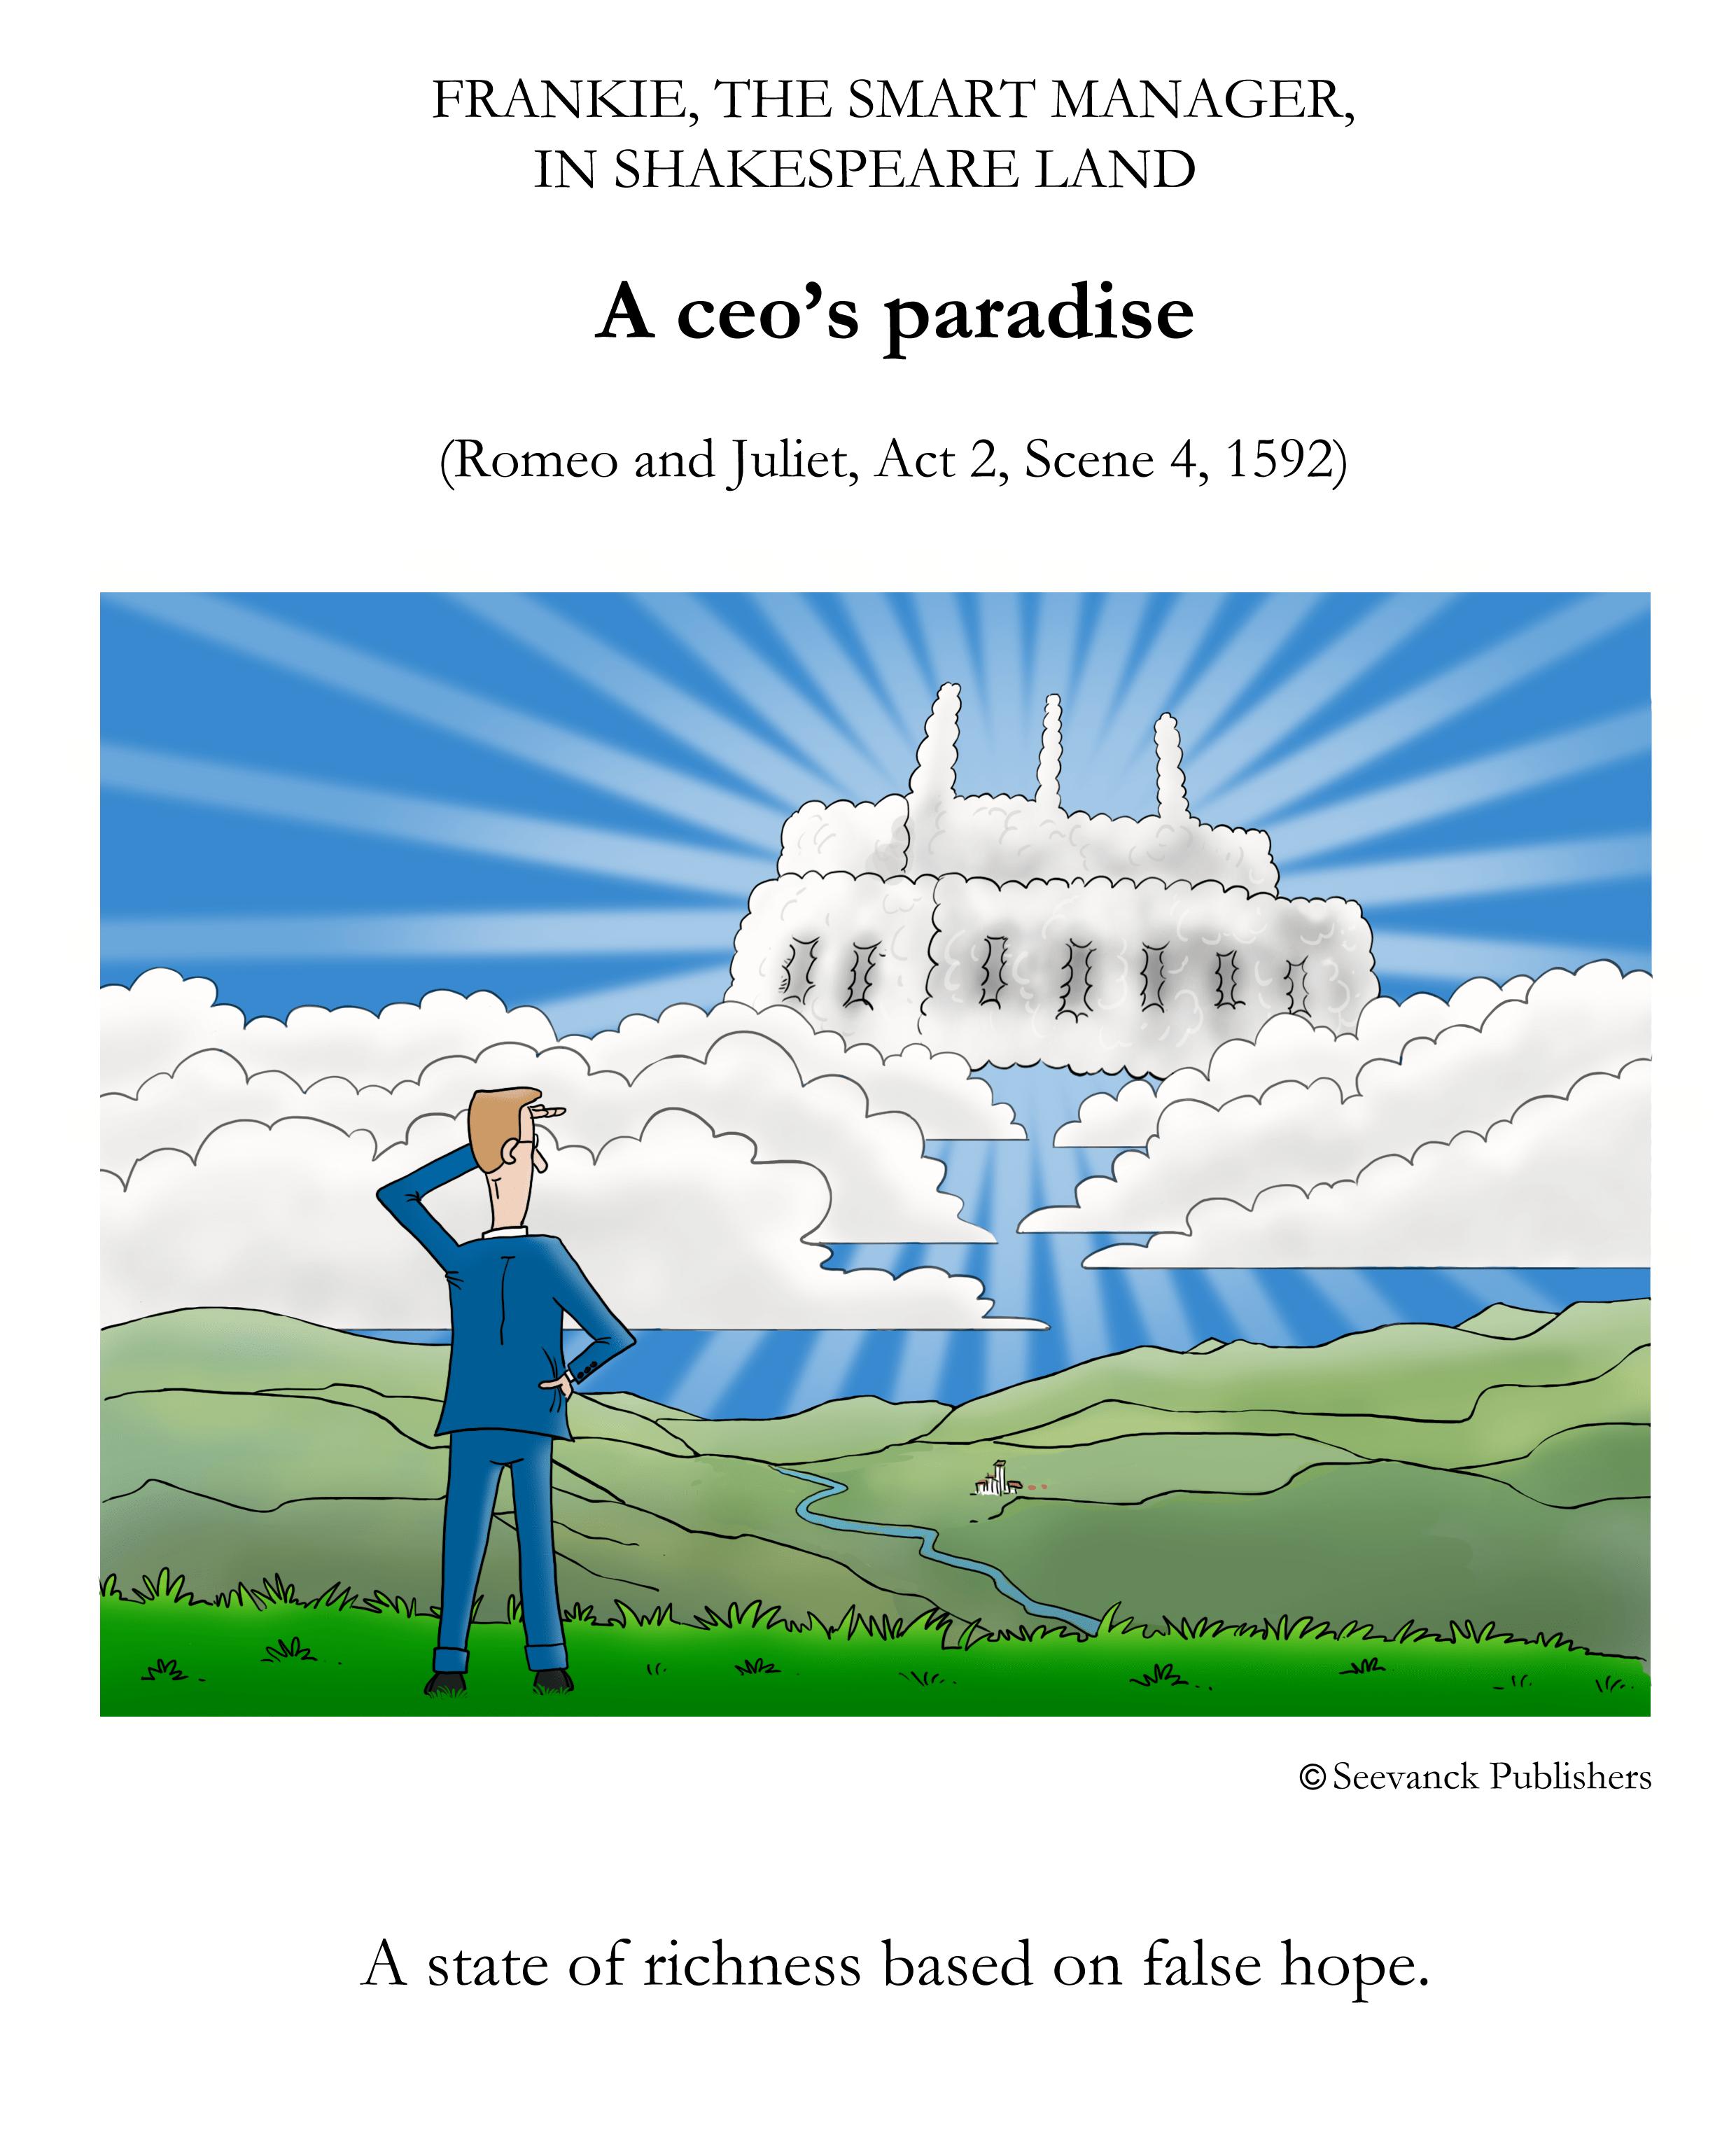 a fool's paradise